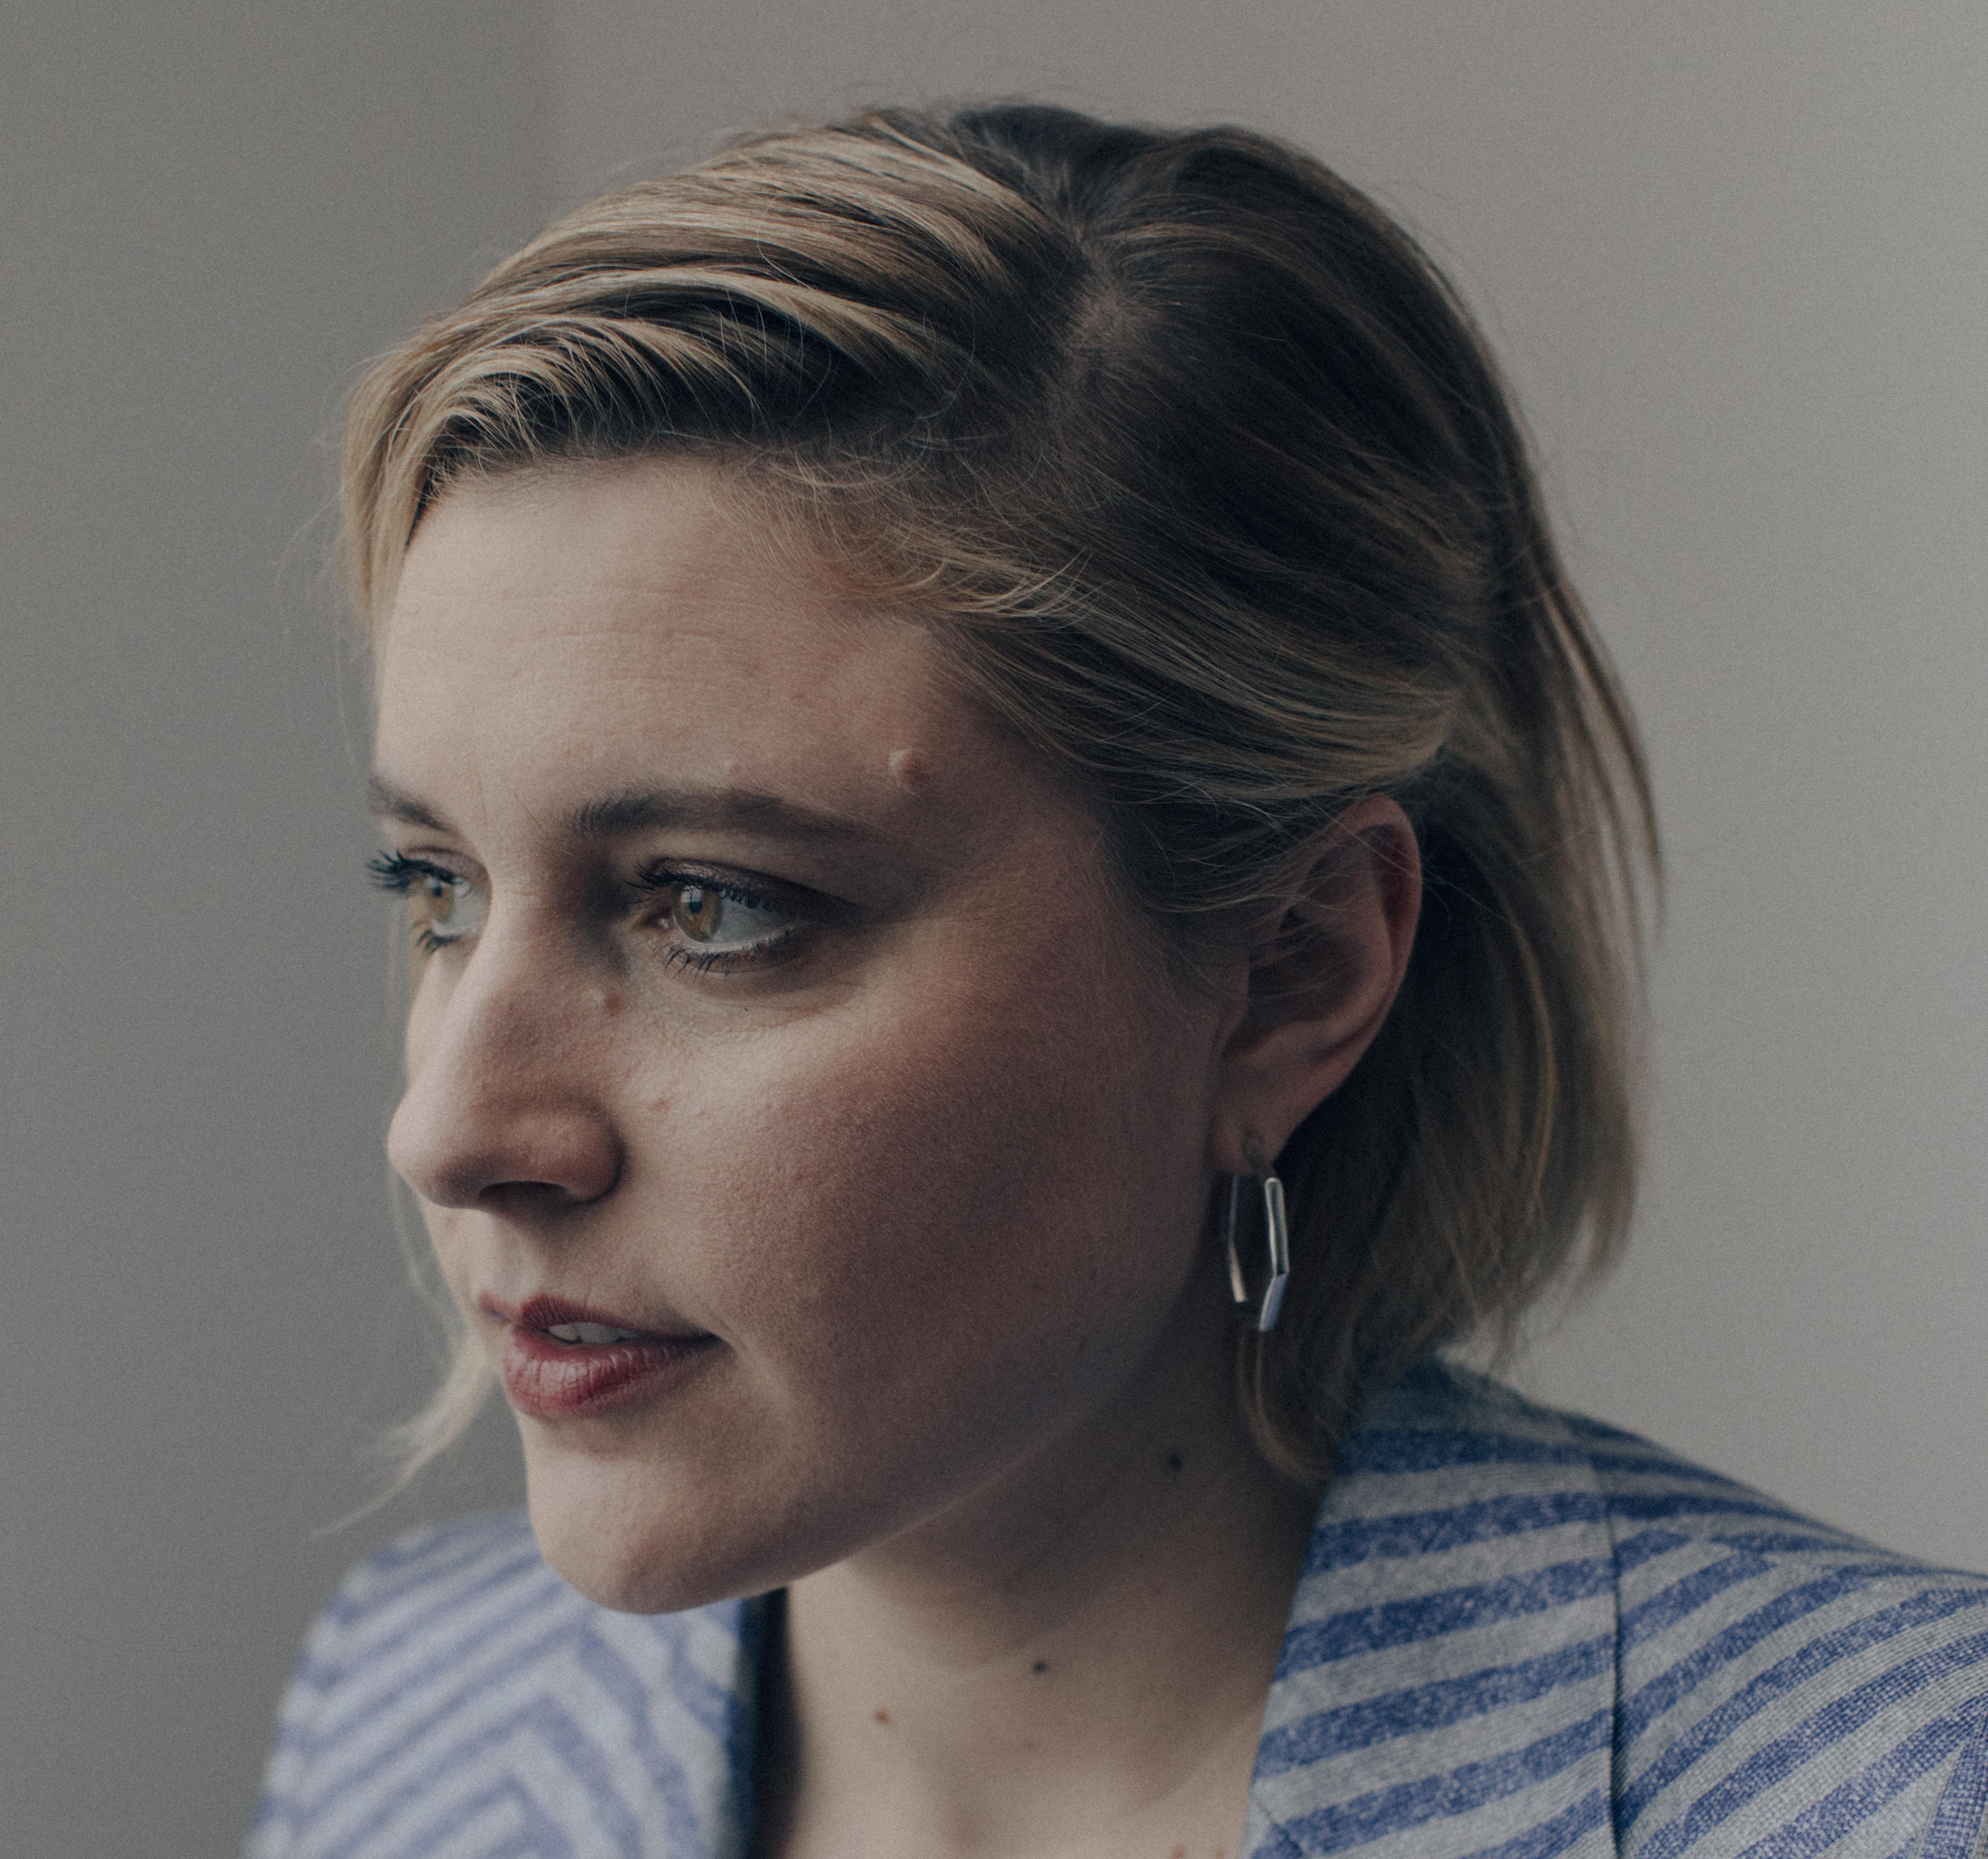 Celeste Sloman Photographs Greta Gerwig for The Washington Post